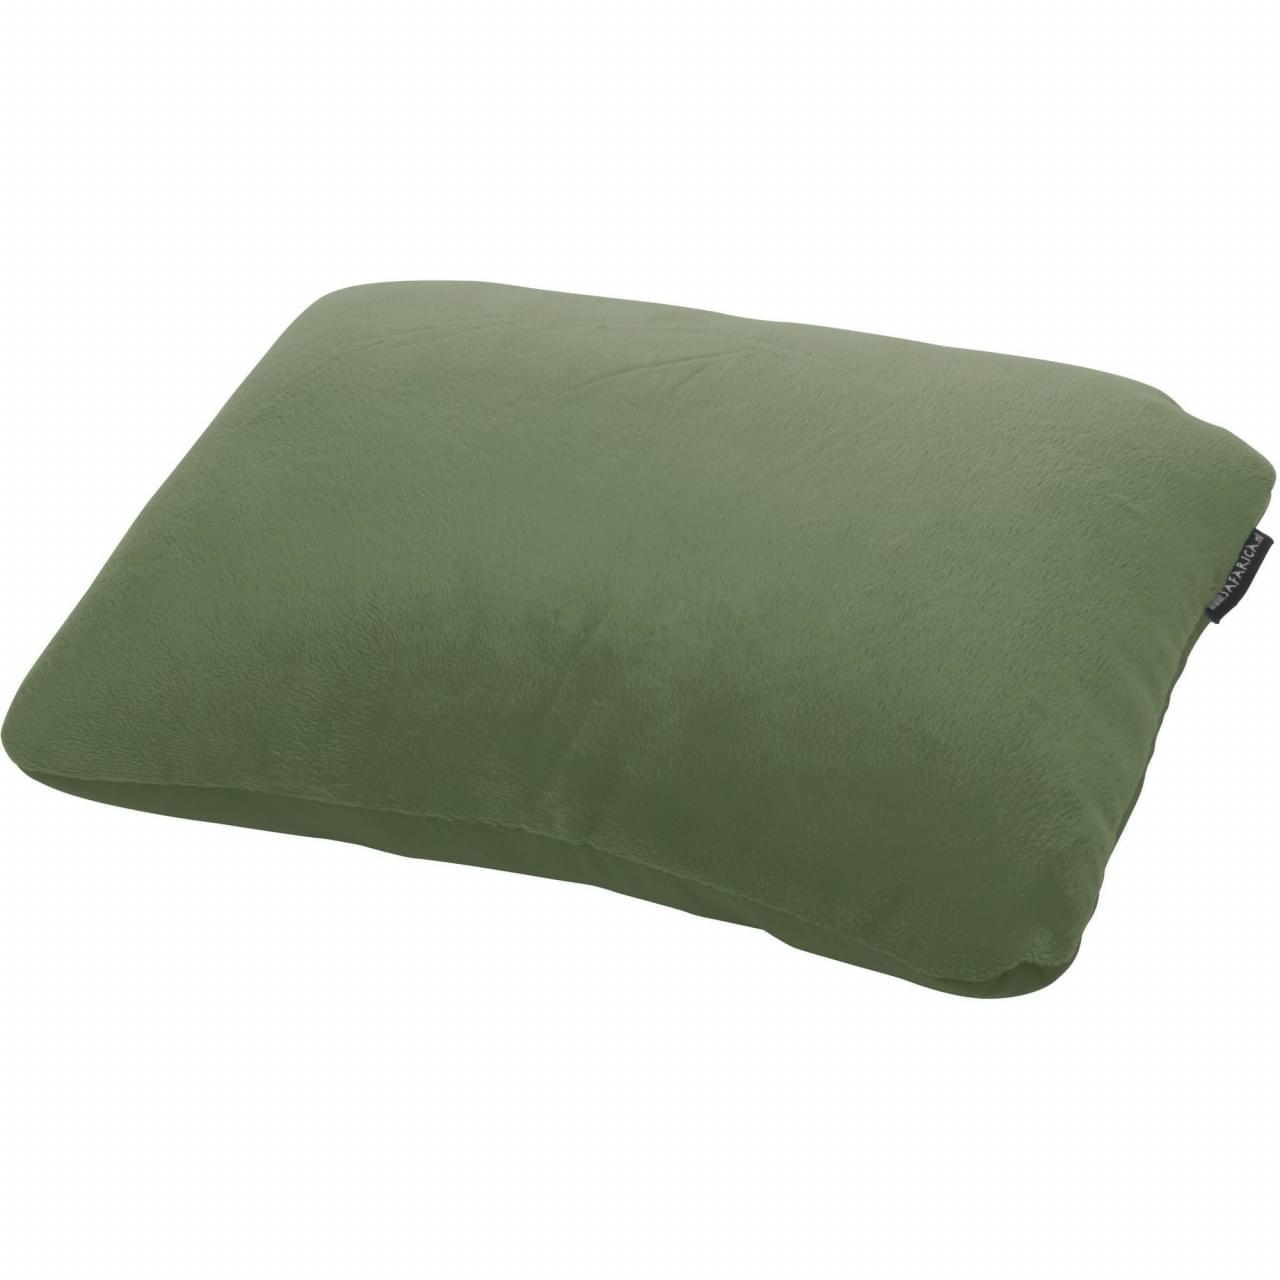 Safarica Multi kussen - Groen